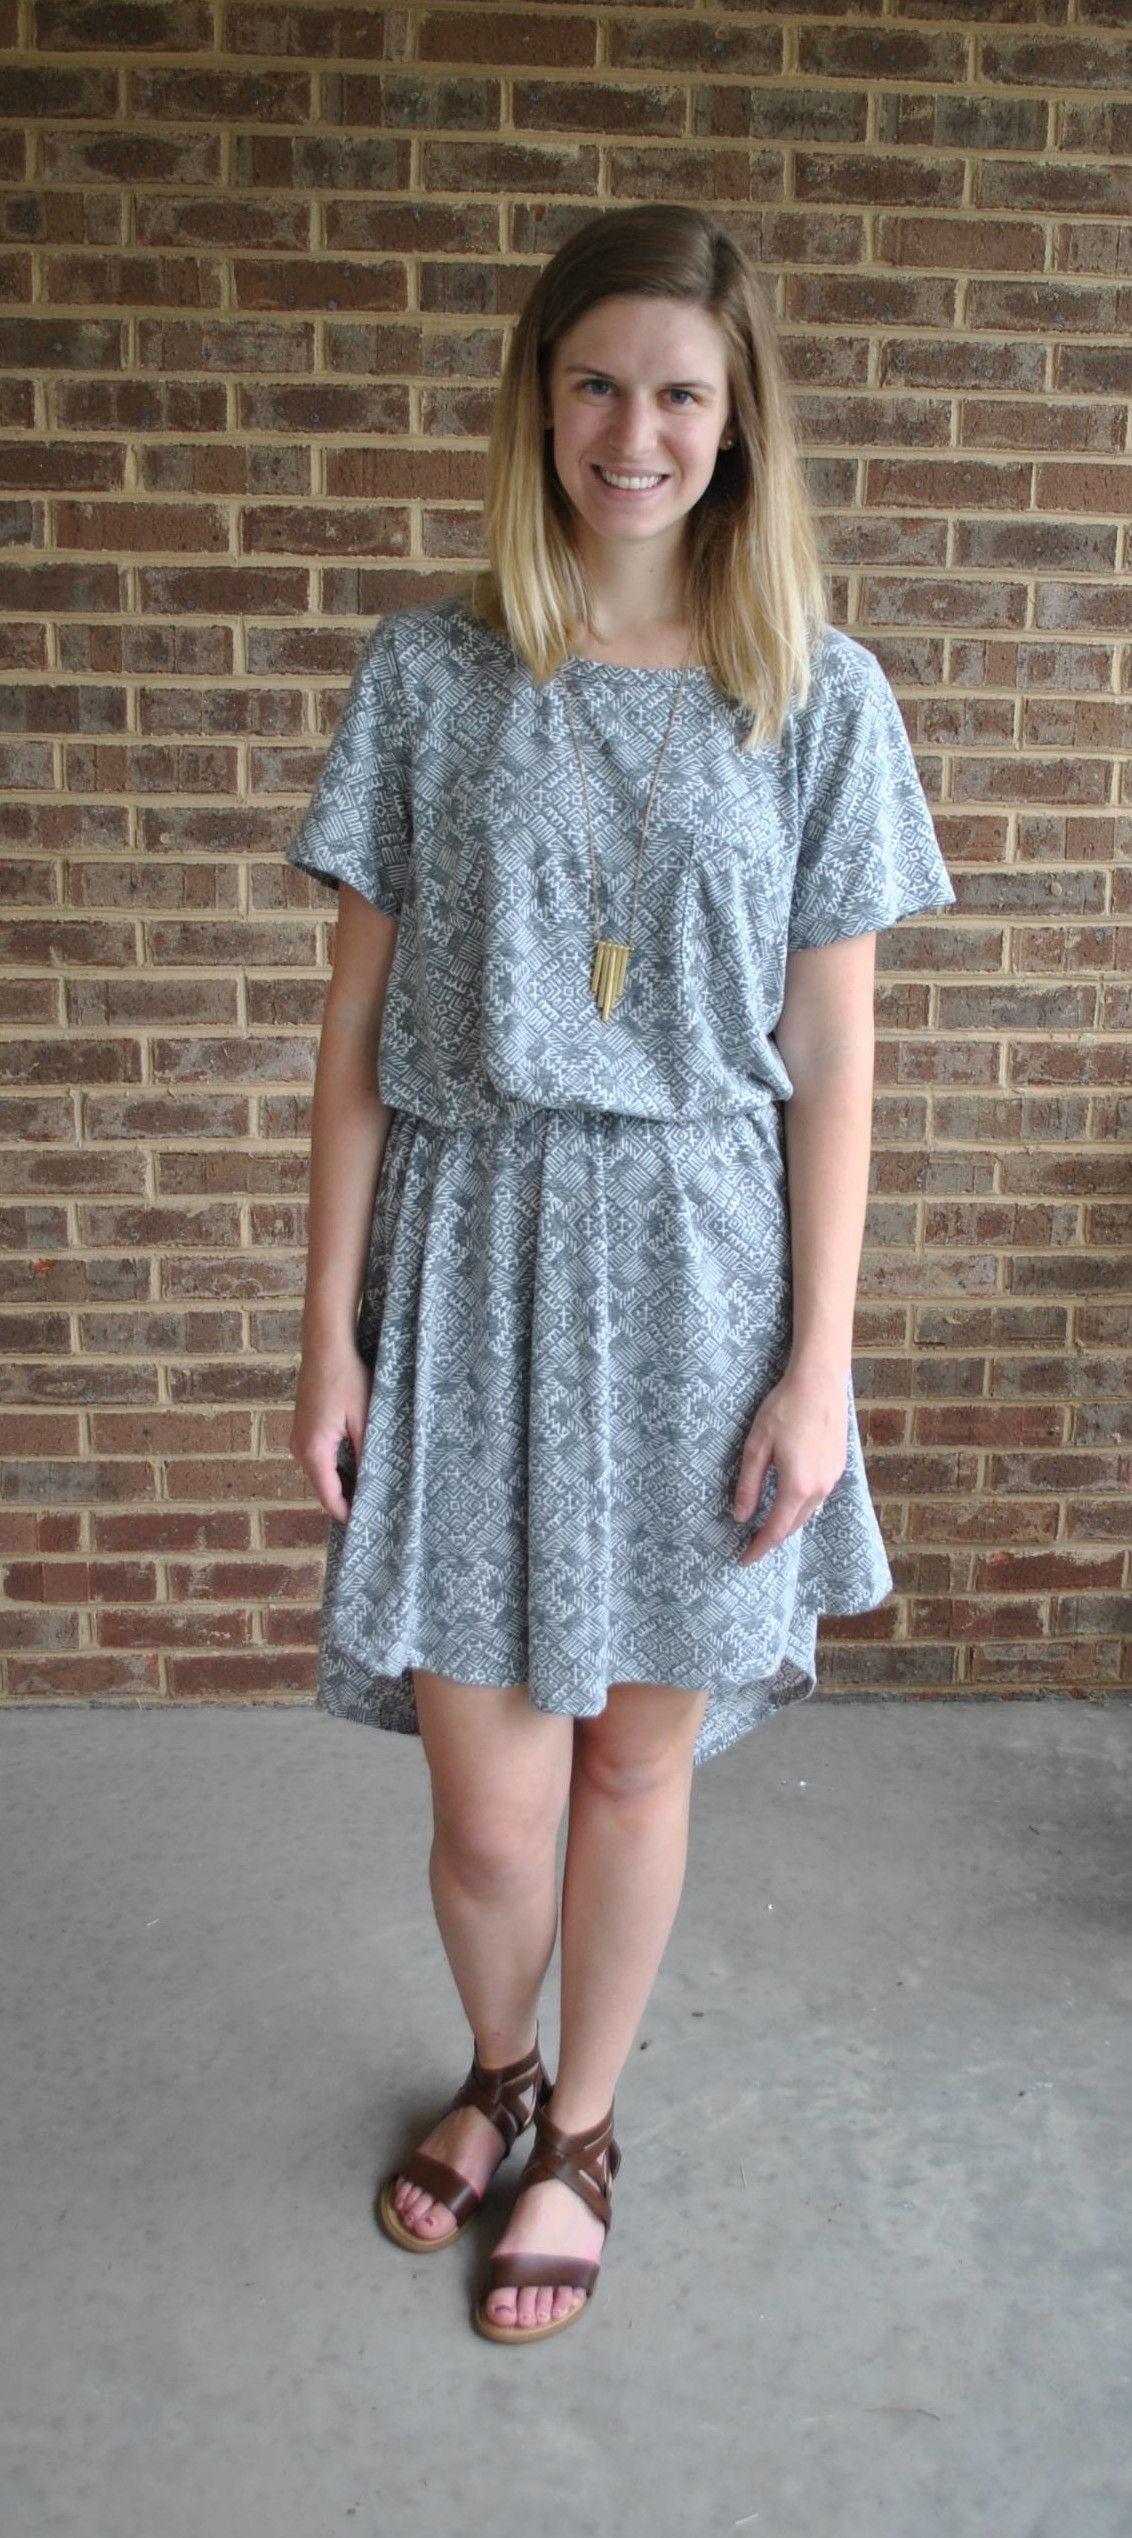 LuLaRoe Carly Dress // shopallthelula.c | LuLaRoe | Pinterest ...